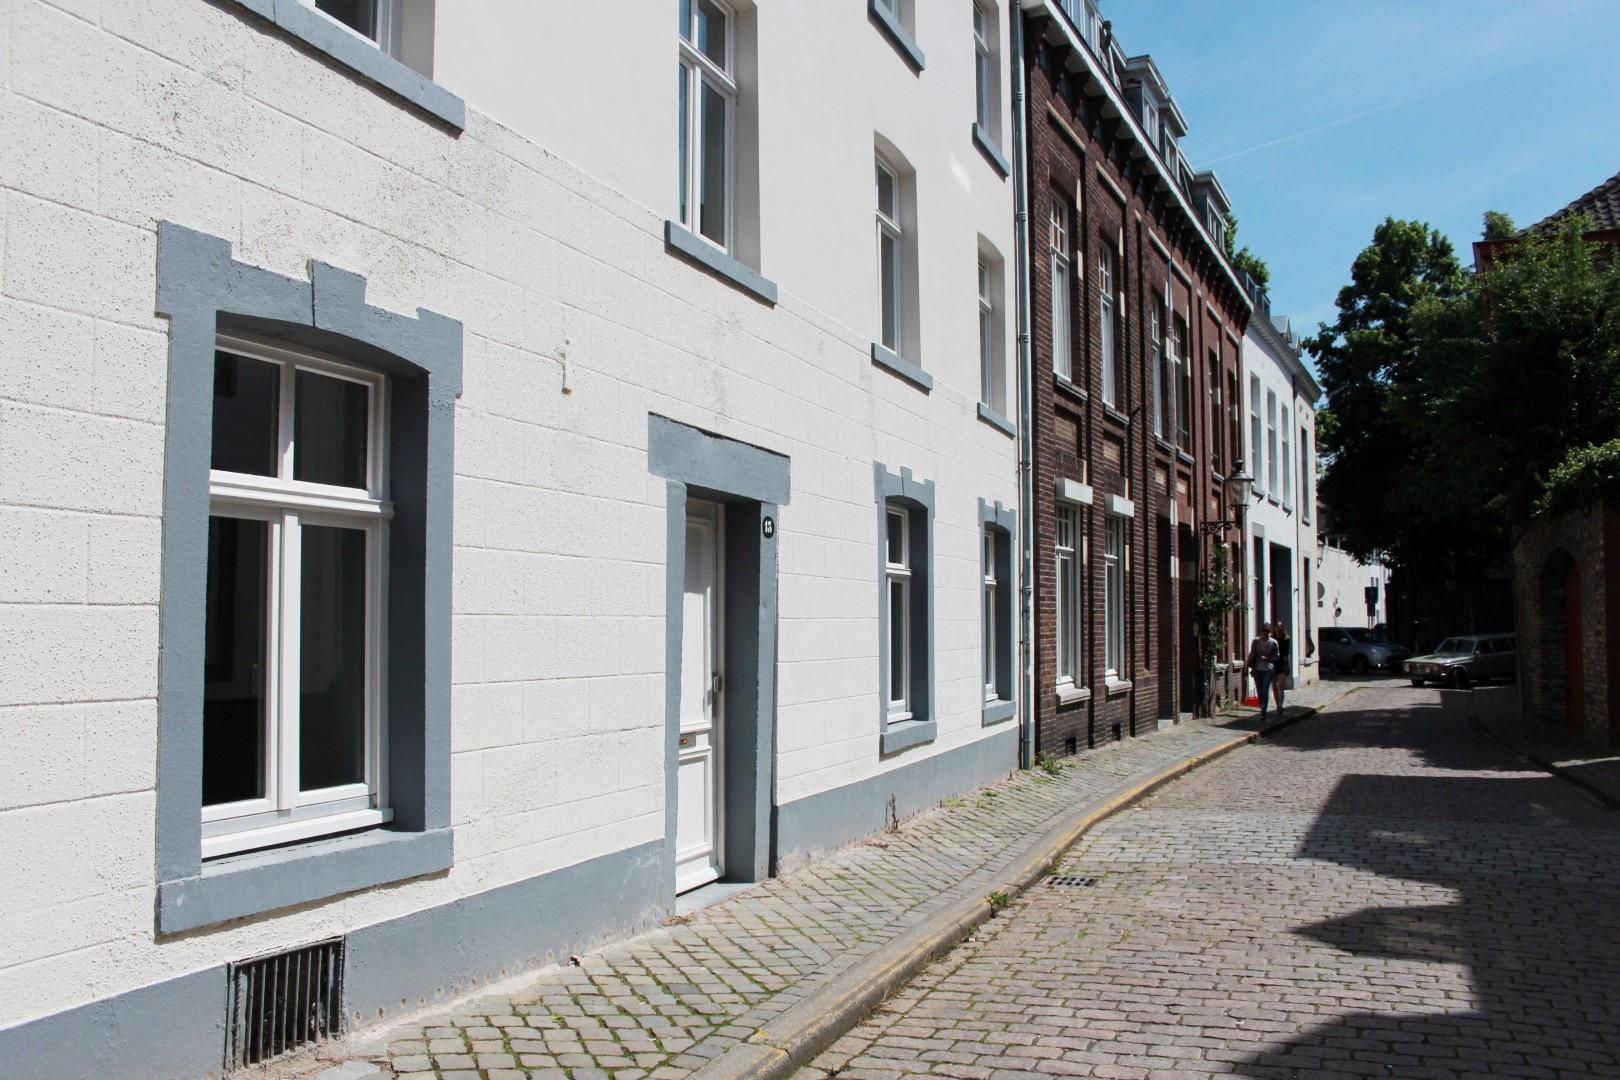 Looiersgracht, Maastricht